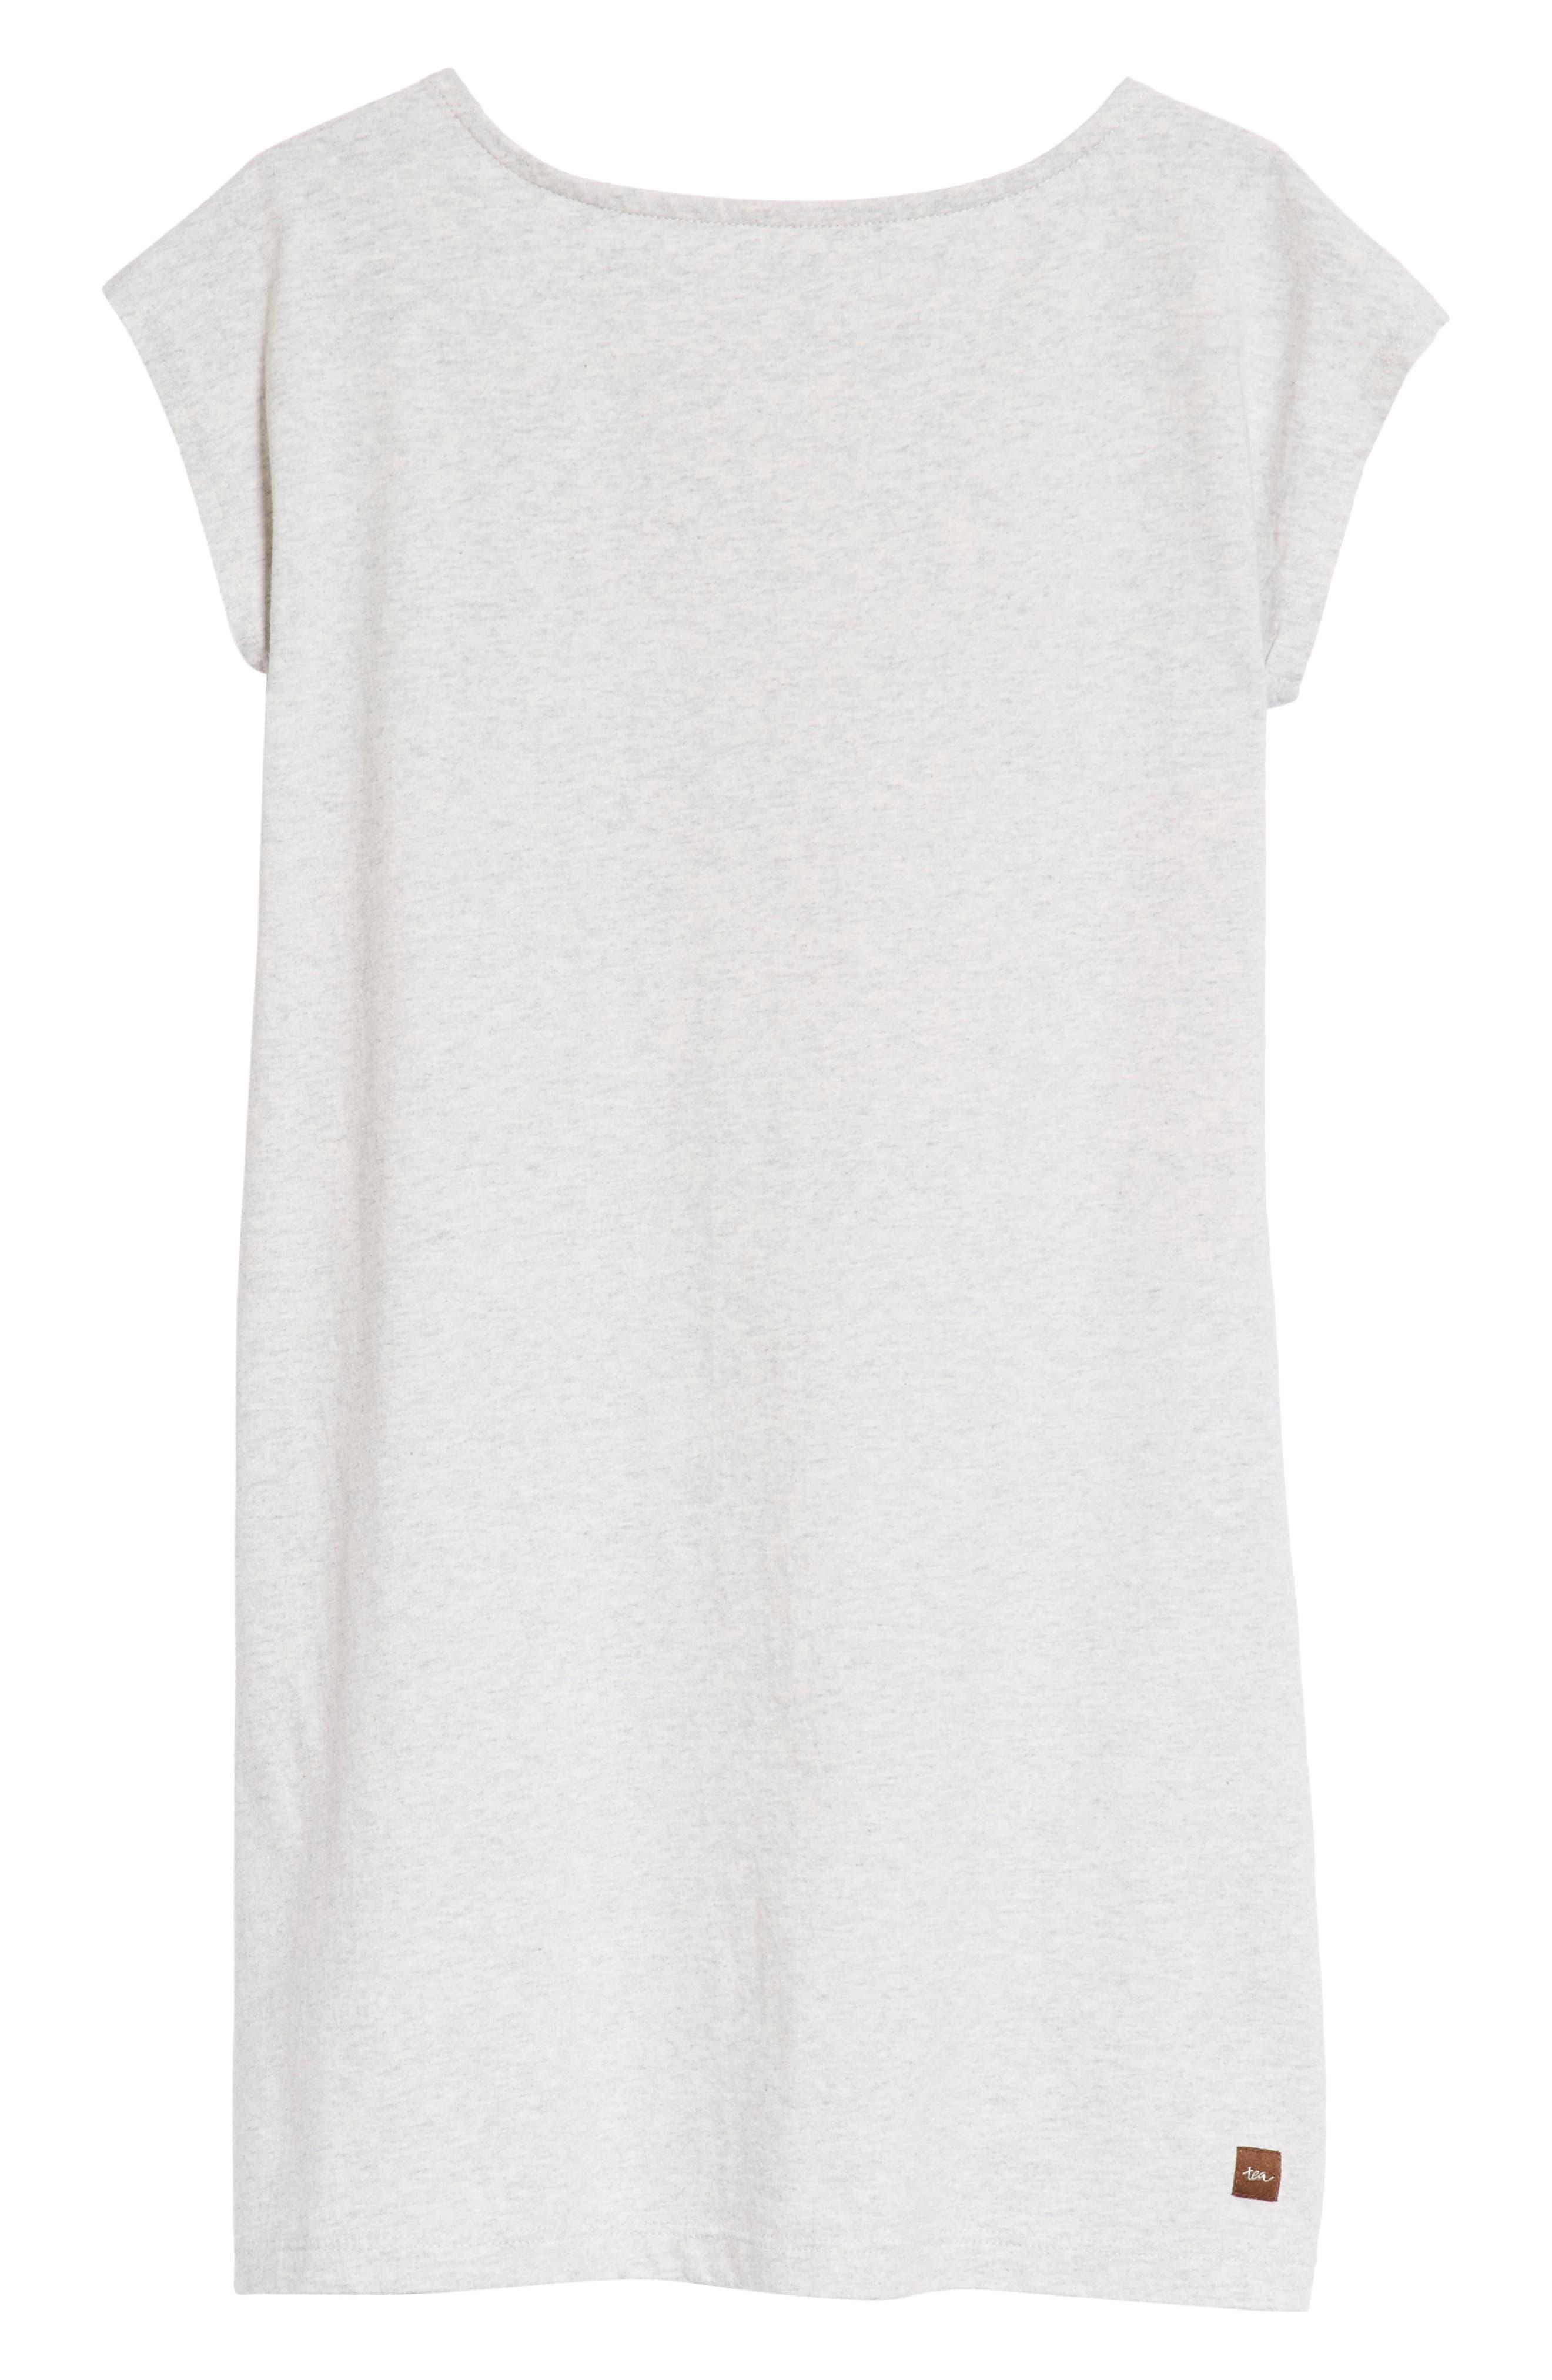 Flamingo T-Shirt Dress,                             Alternate thumbnail 2, color,                             Light Grey Heather